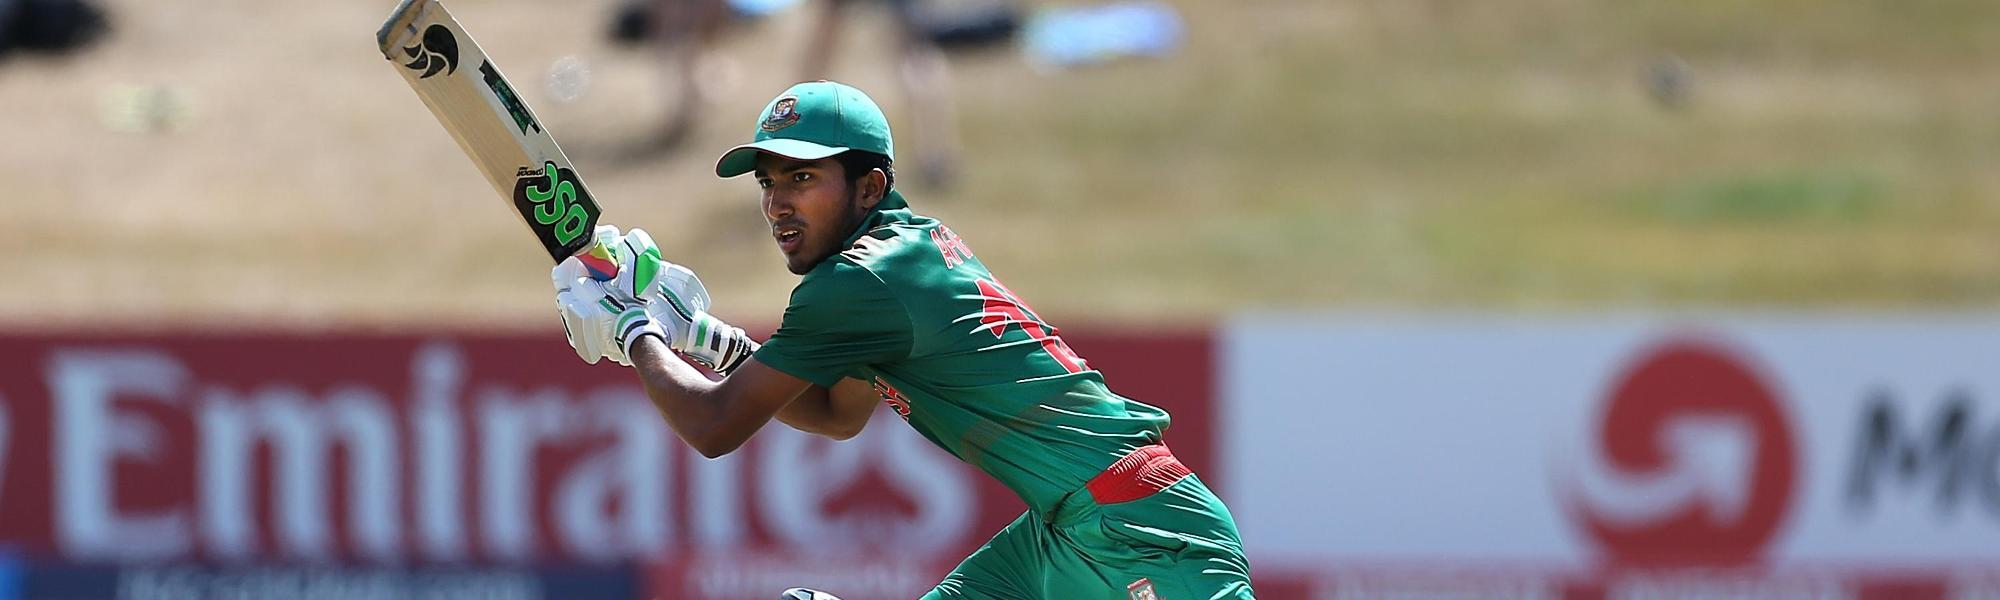 Afif Hossain Dhrubo of Bangladesh batting